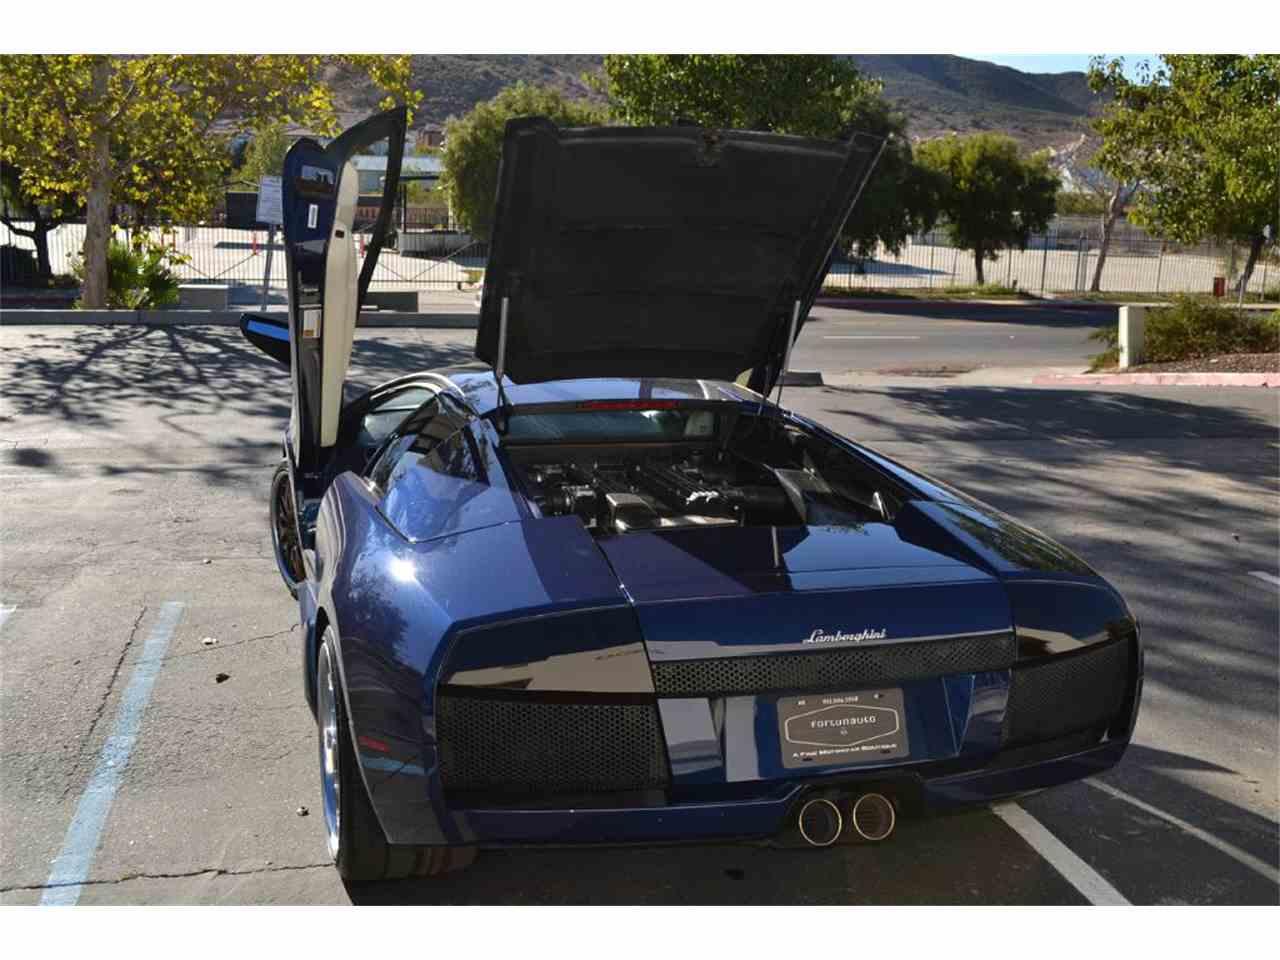 Large Picture of 2004 Lamborghini Murcielago - $110,000.00 Offered by Fortunauto 13 LLC - LVJ1